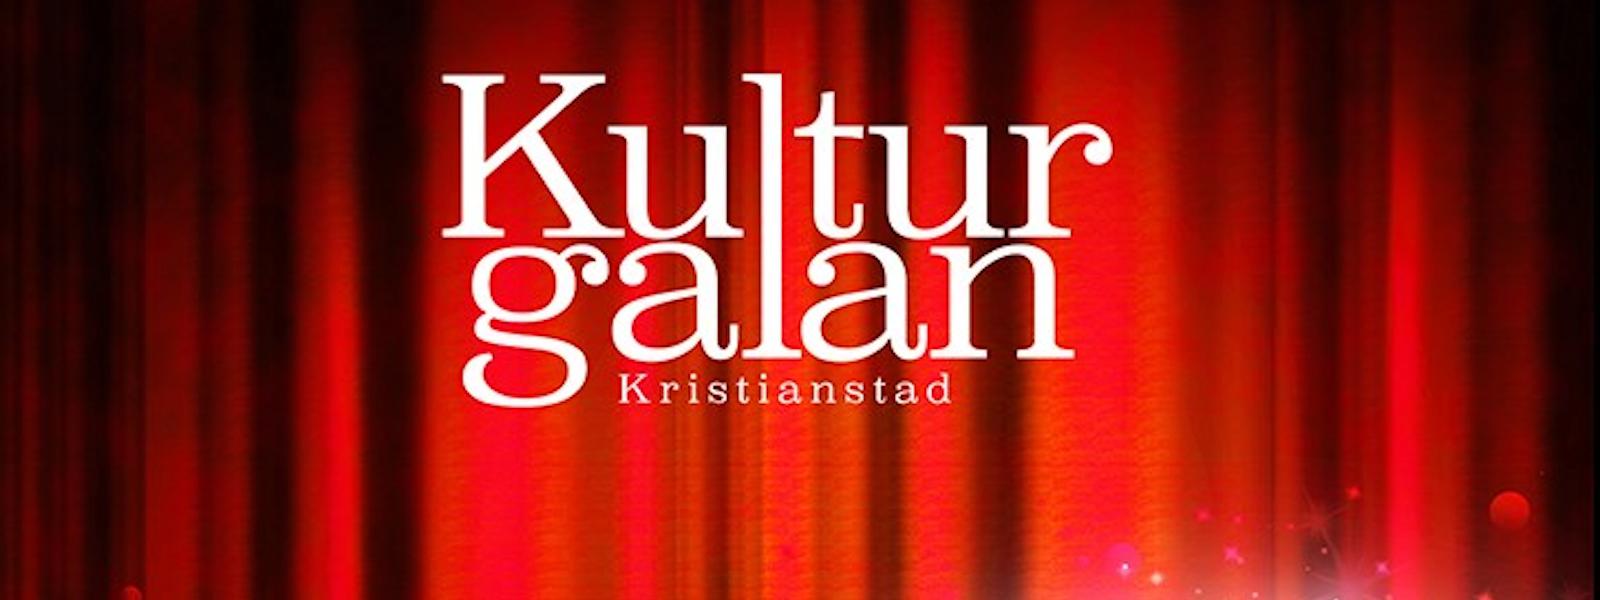 Bild - Kulturgalan 2019